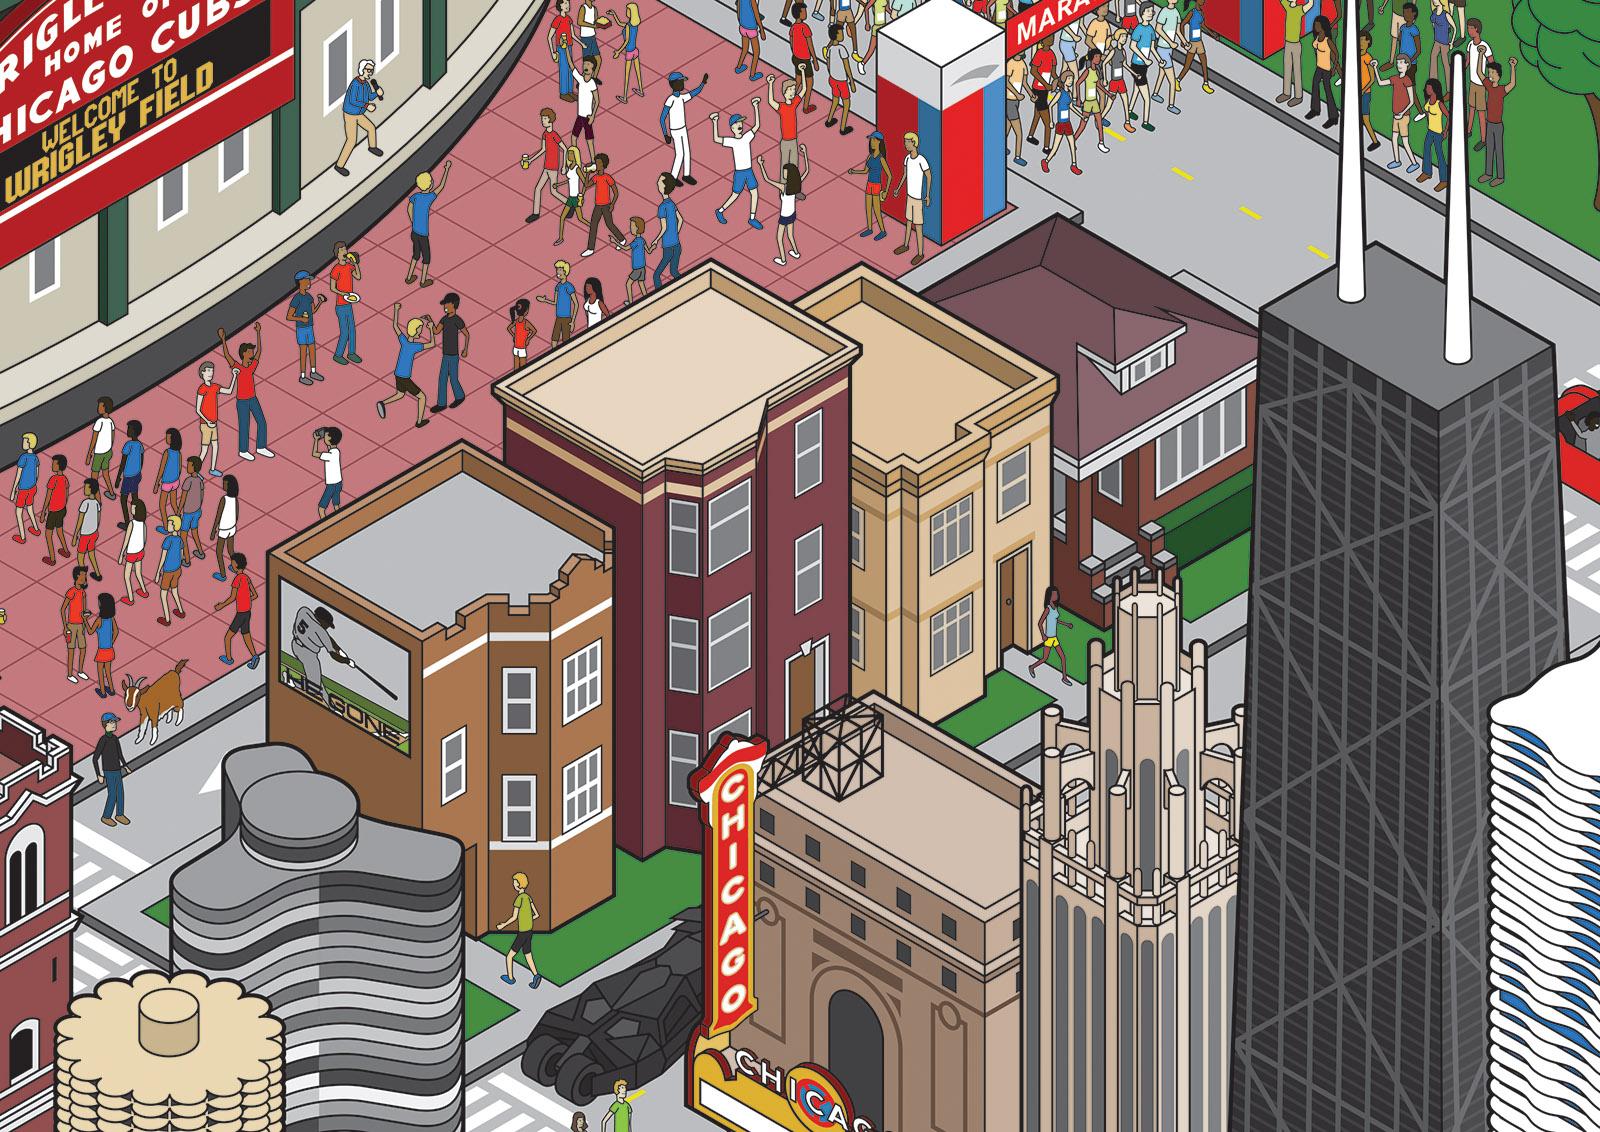 ultimate-chicago-detail1.jpg